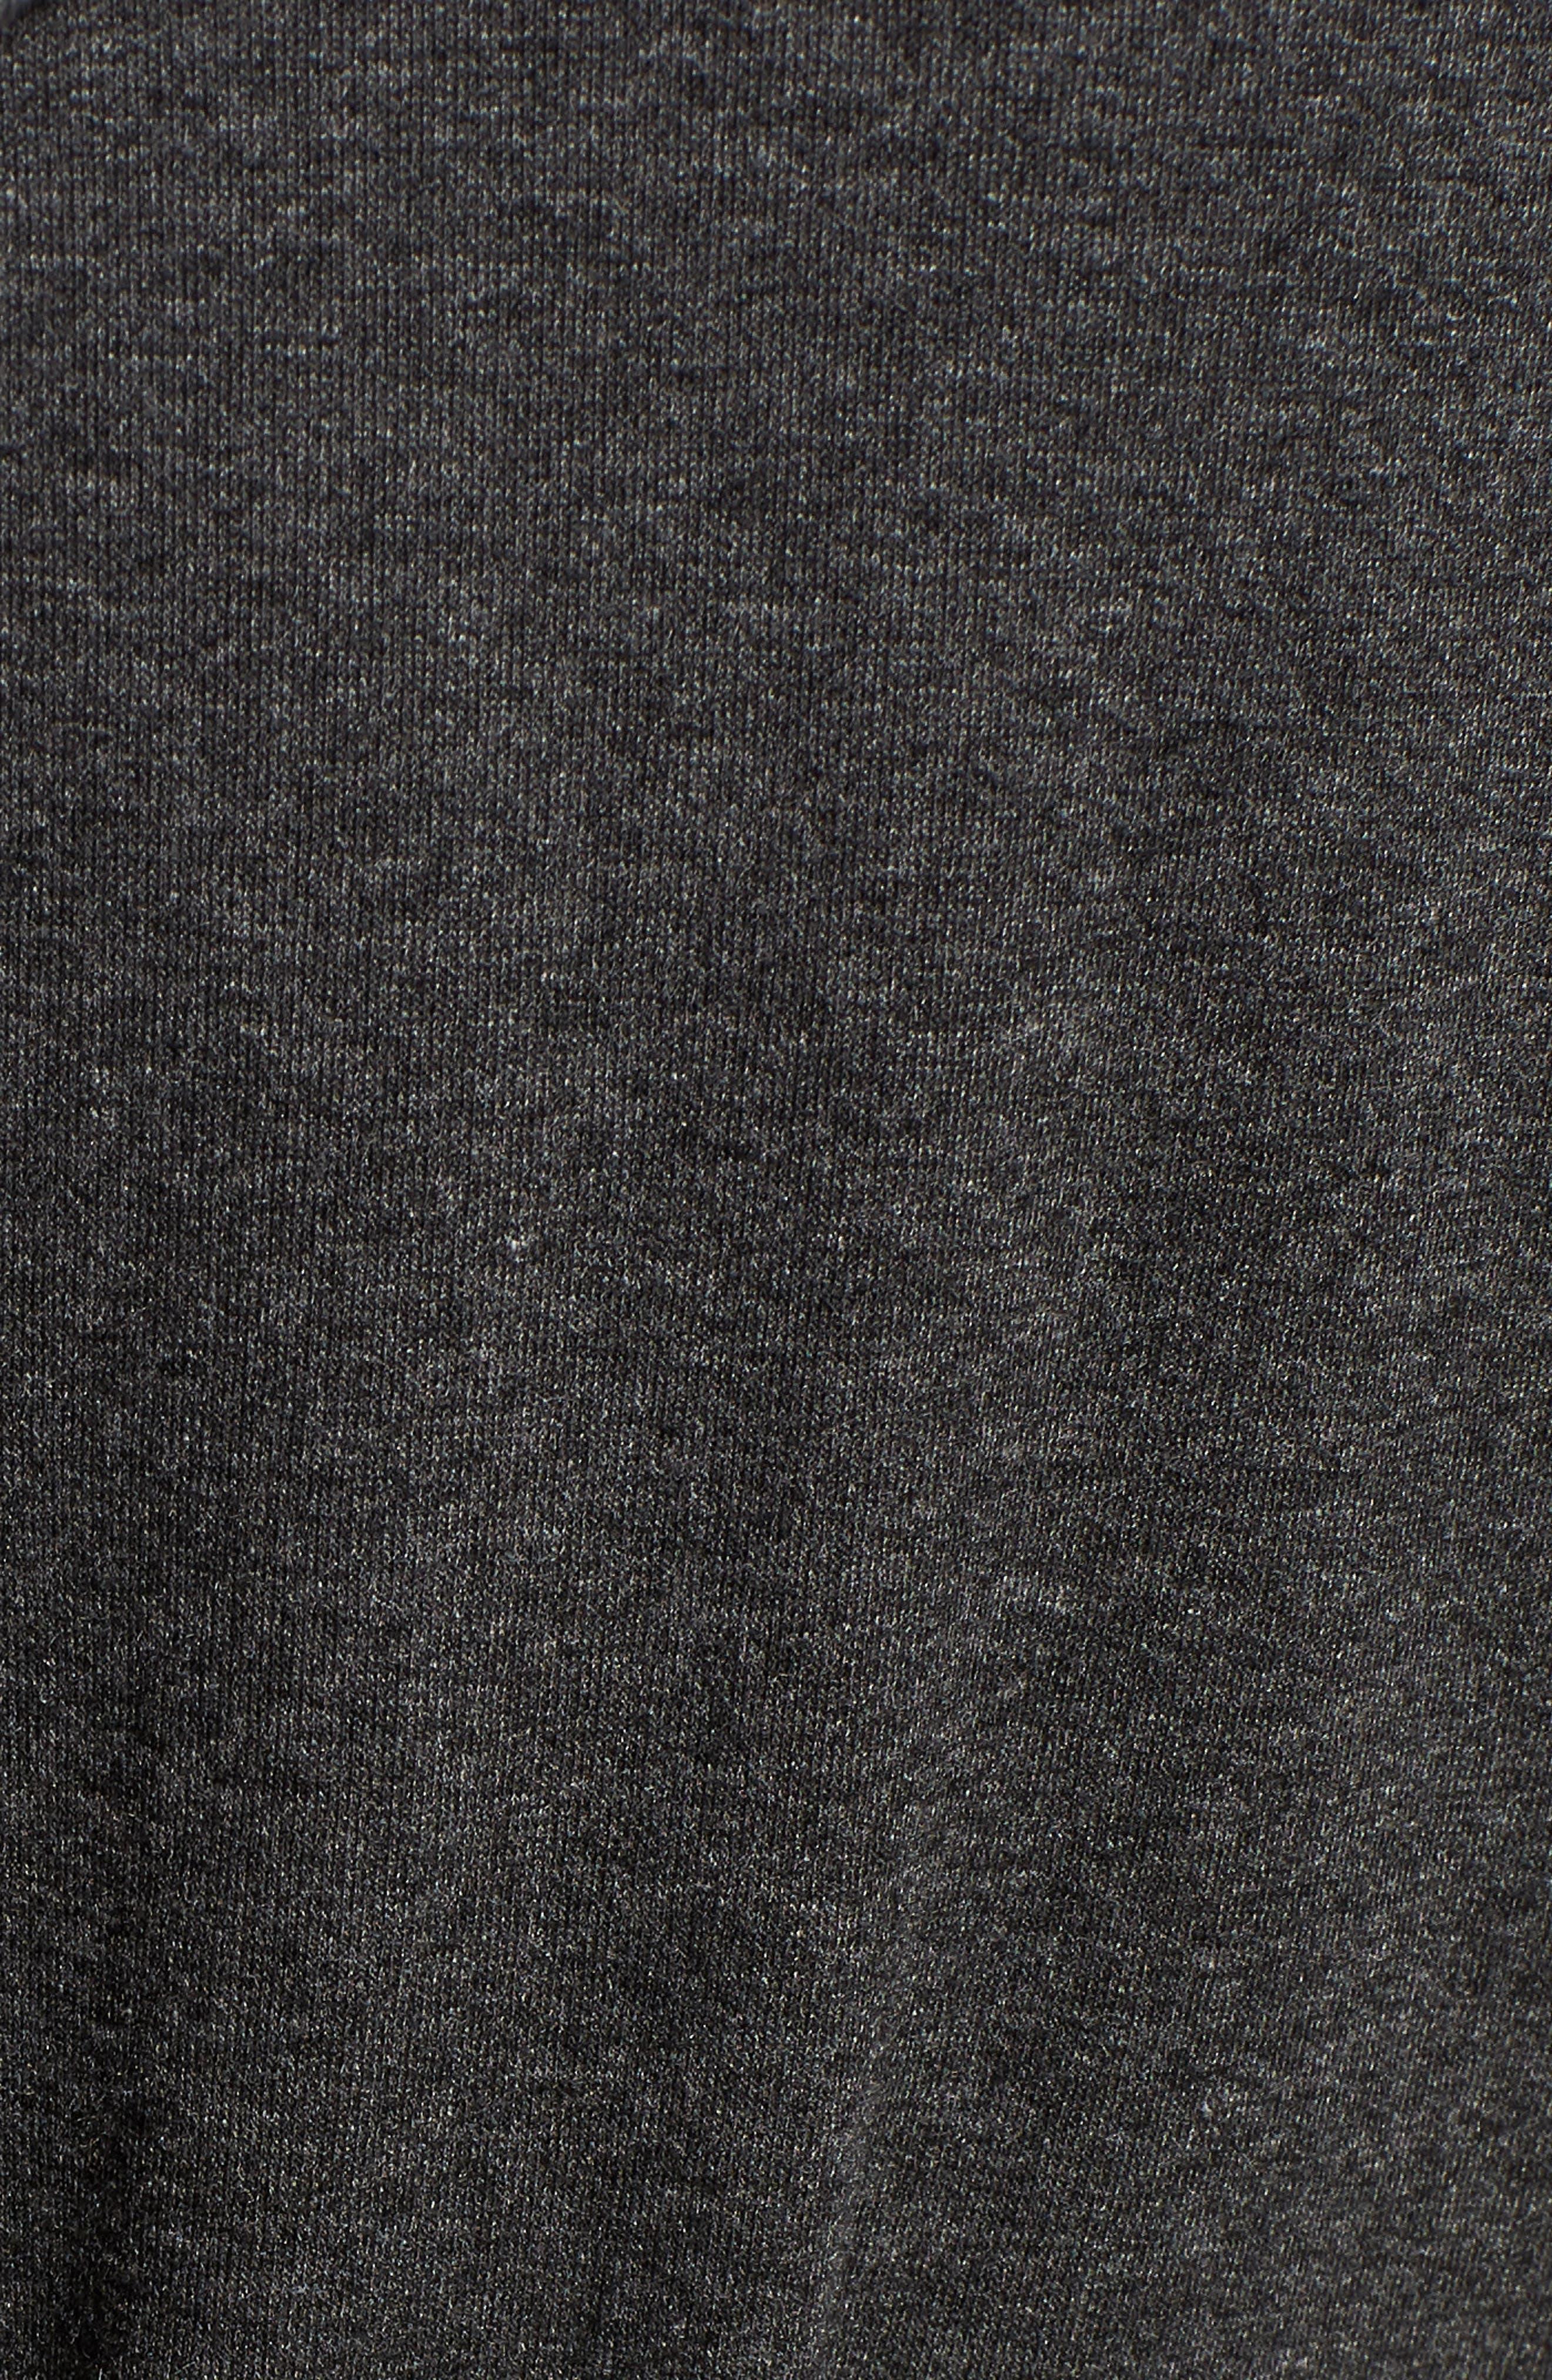 Draped Hooded Cardigan,                             Alternate thumbnail 6, color,                             CHARCOAL